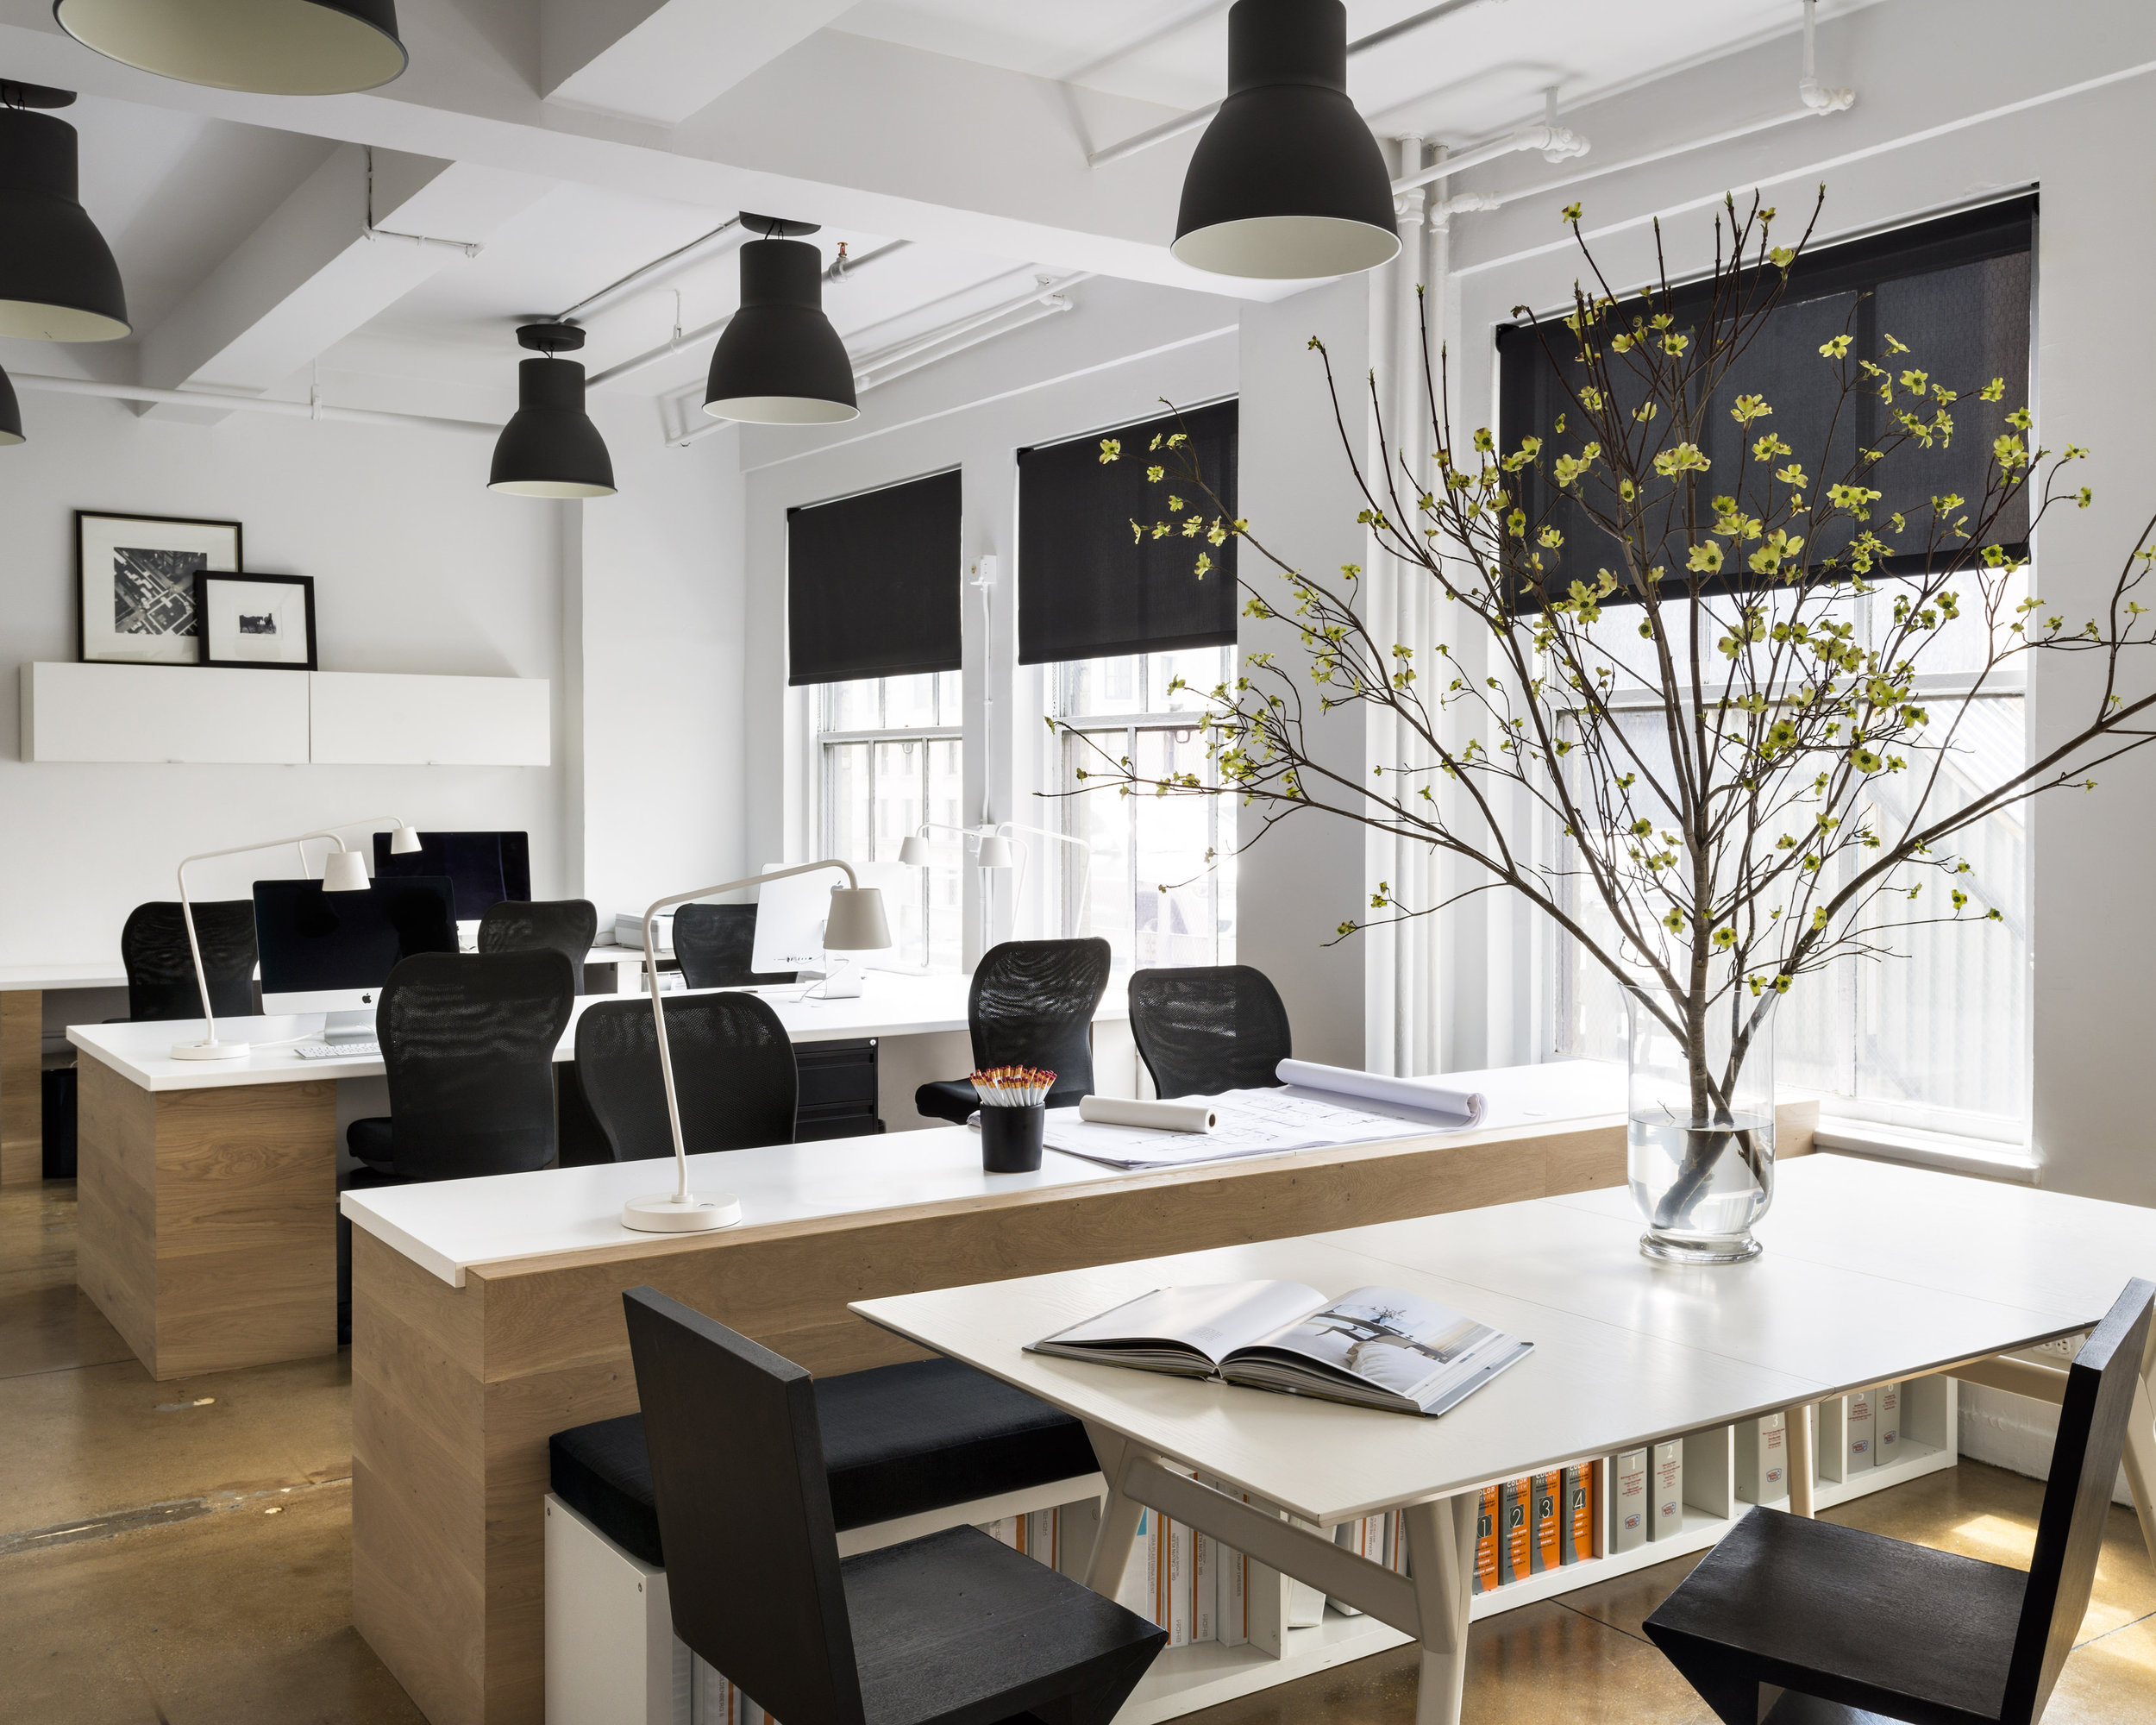 BHDM OFFICE NYC - NOMAD, MANHATTAN